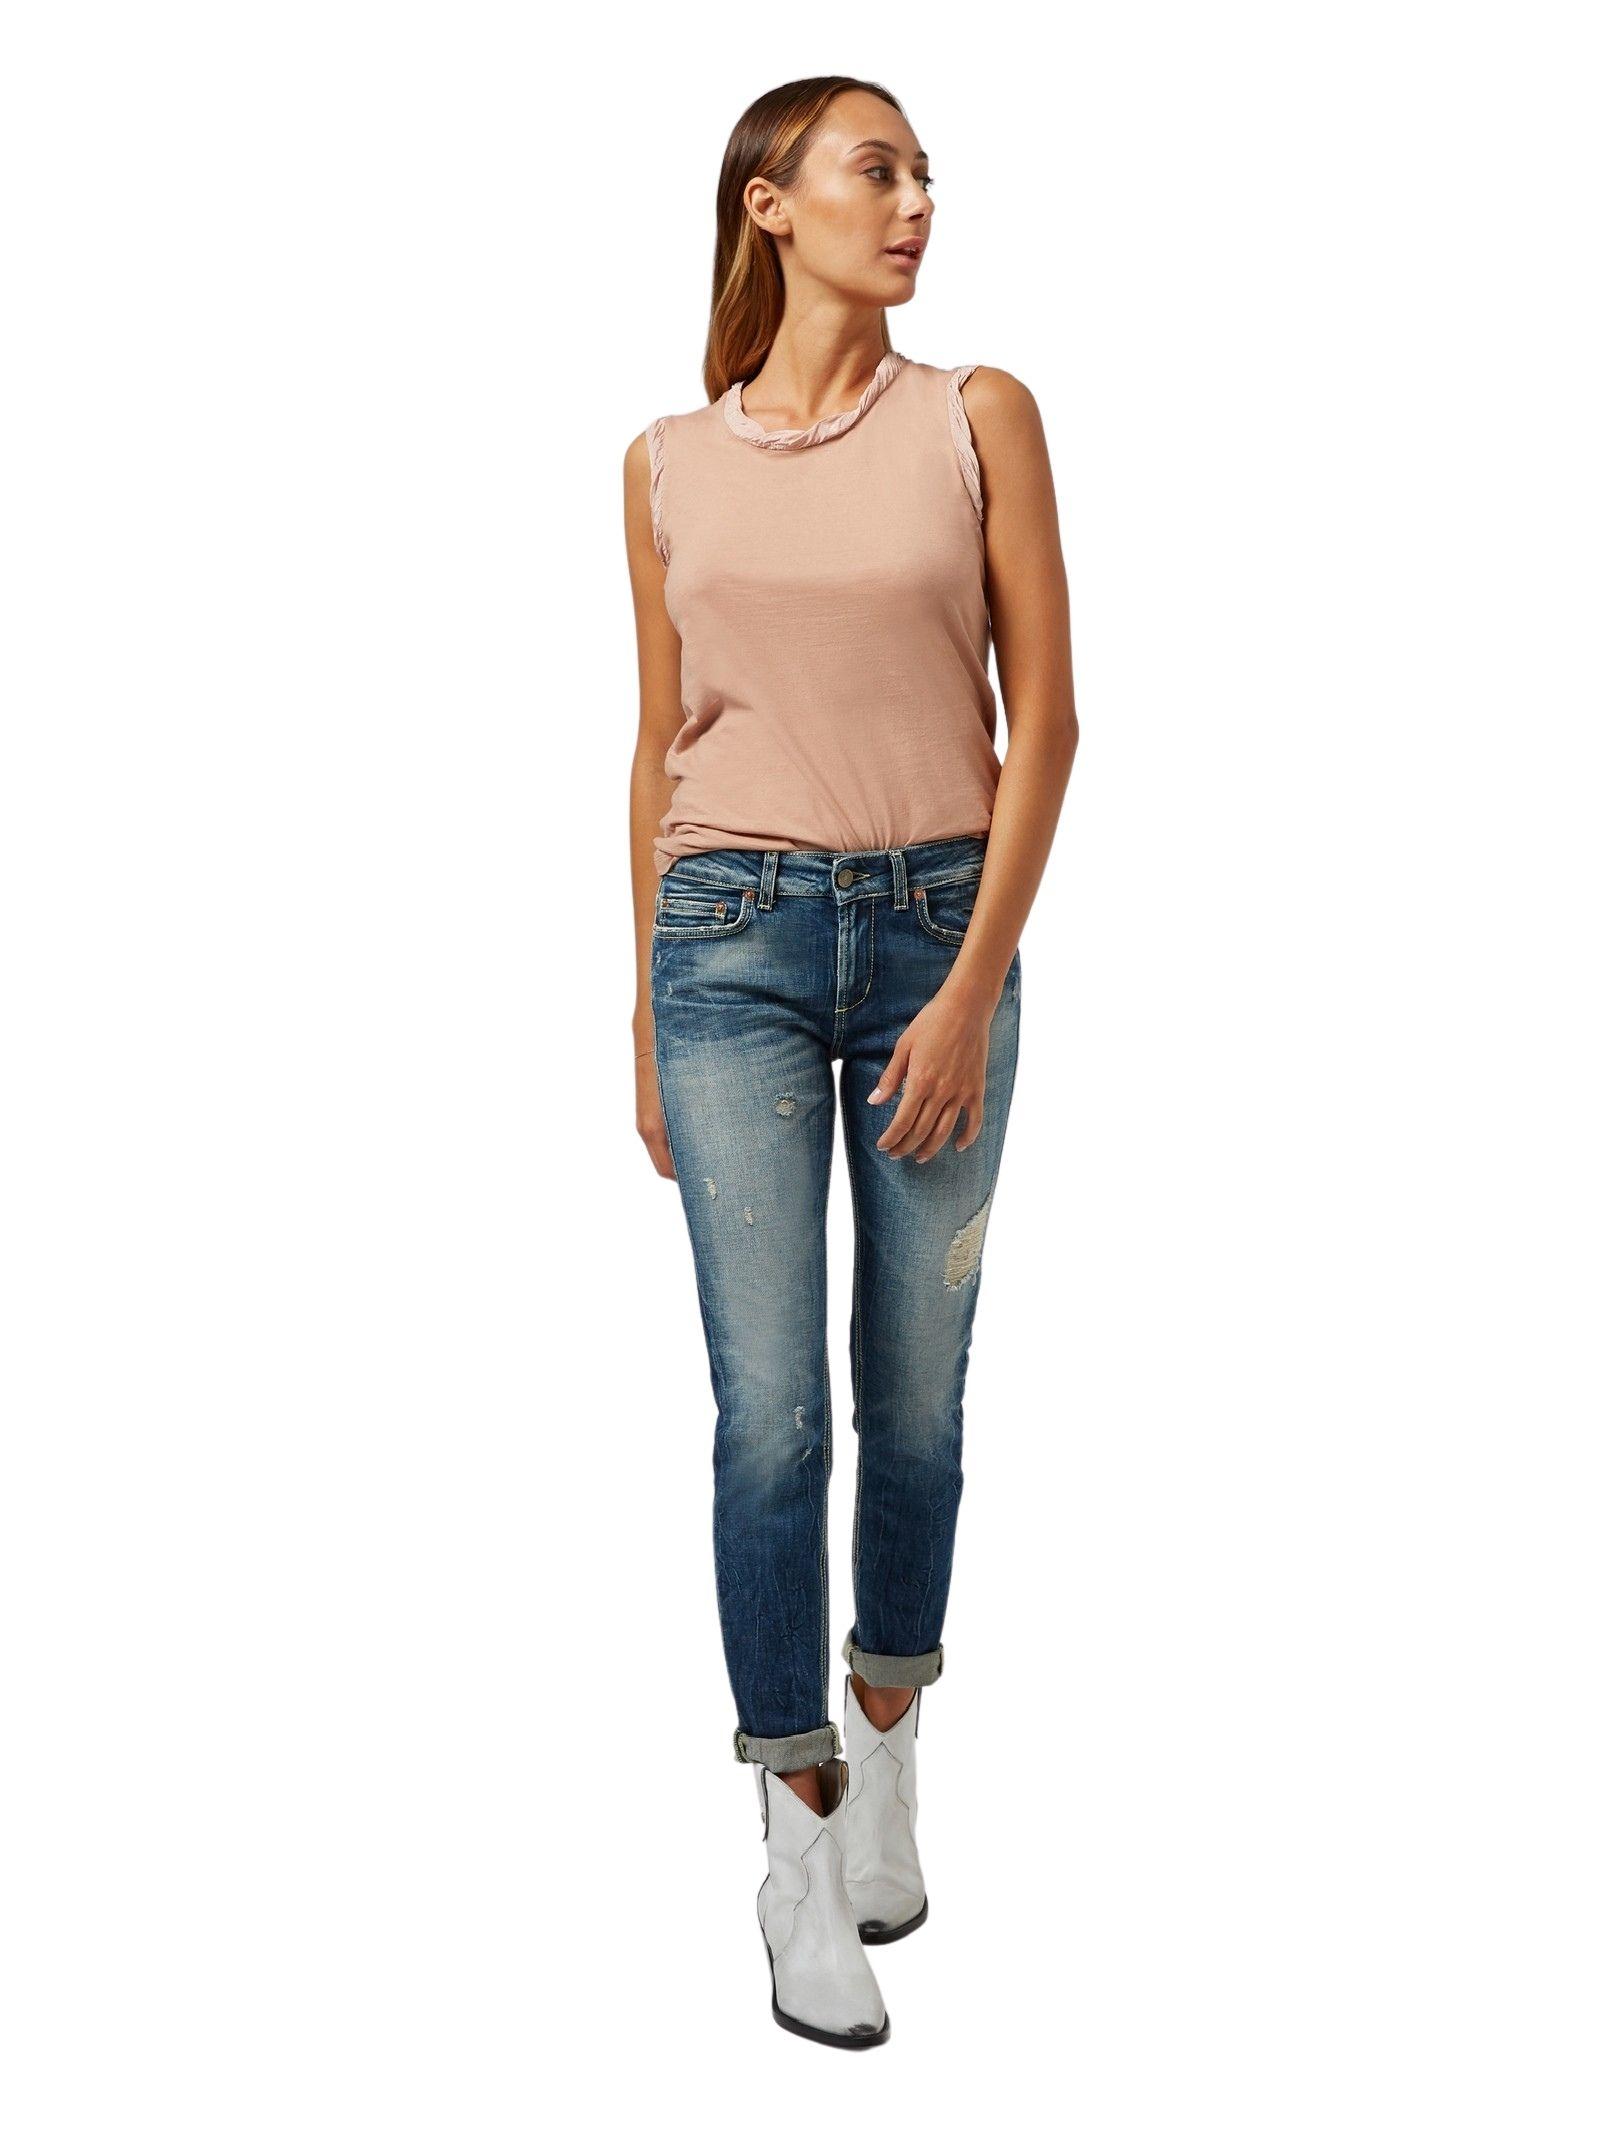 Top rosa smanicato DONDUP | Top | S863 JF0254DPTD 518